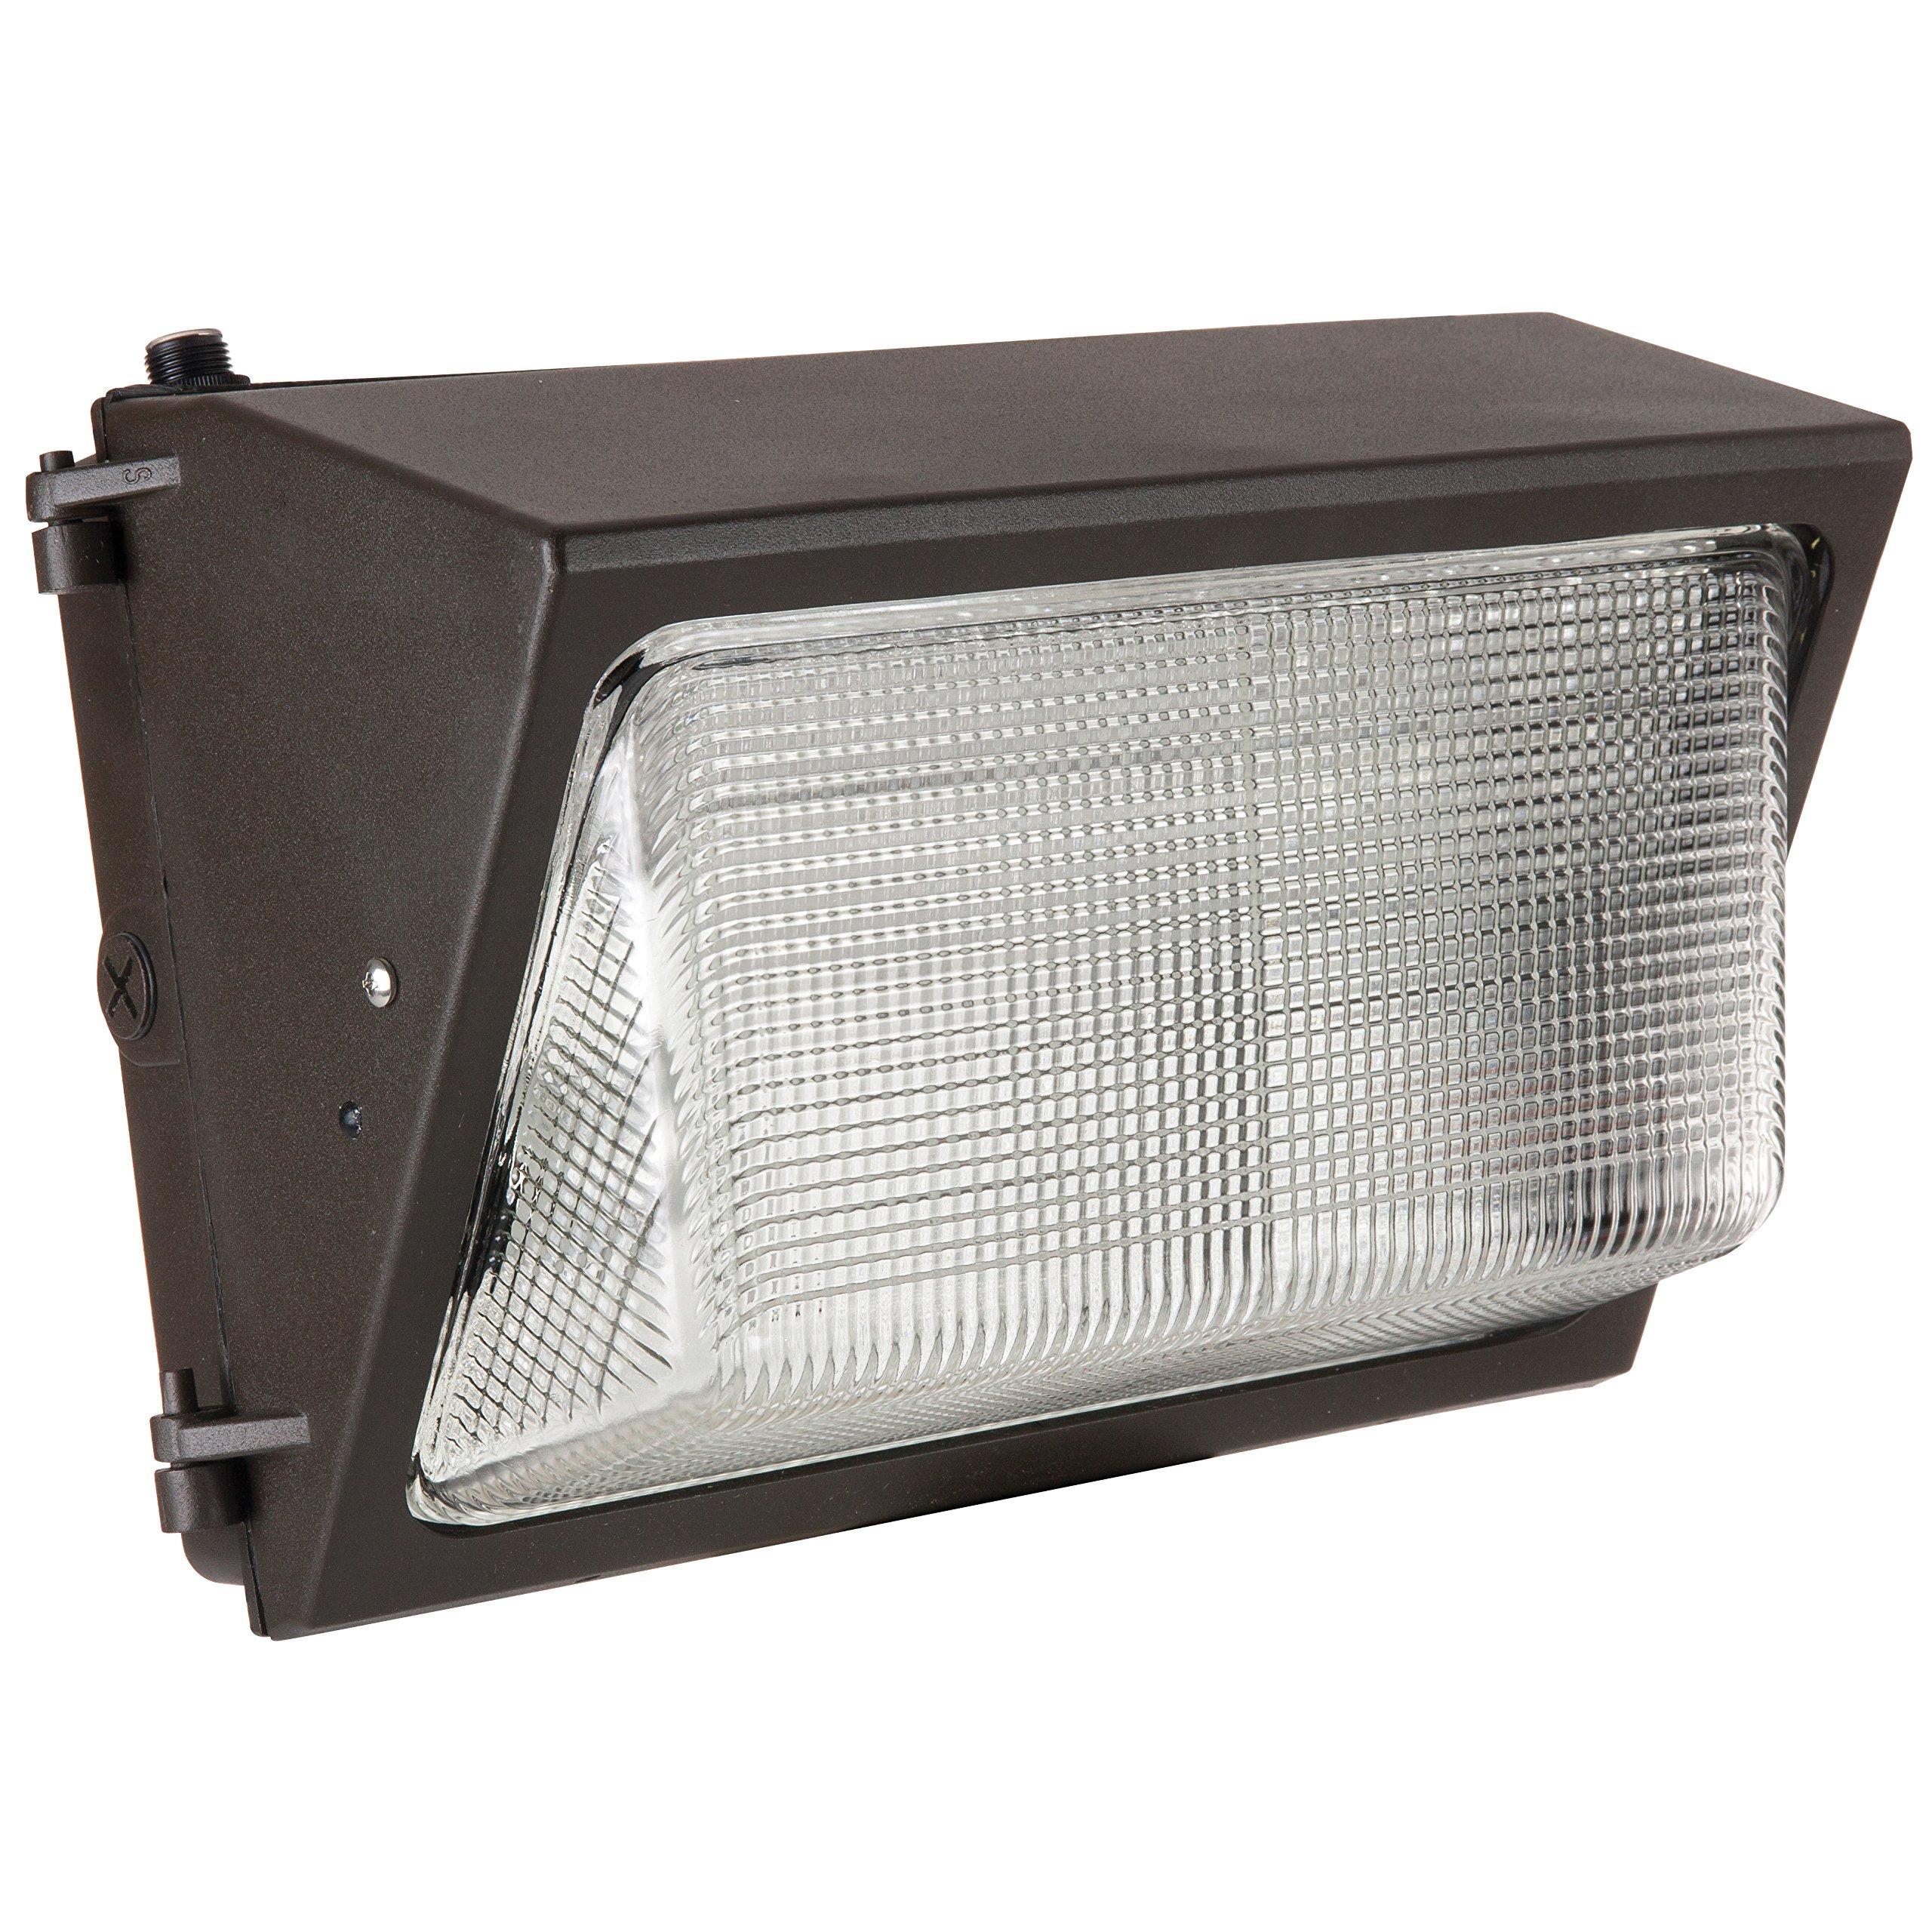 Sunlite 04938-SU WPM175MH/PC 175 Watt Metal Halide Medium Wall Pack Fixture with Photocontrol